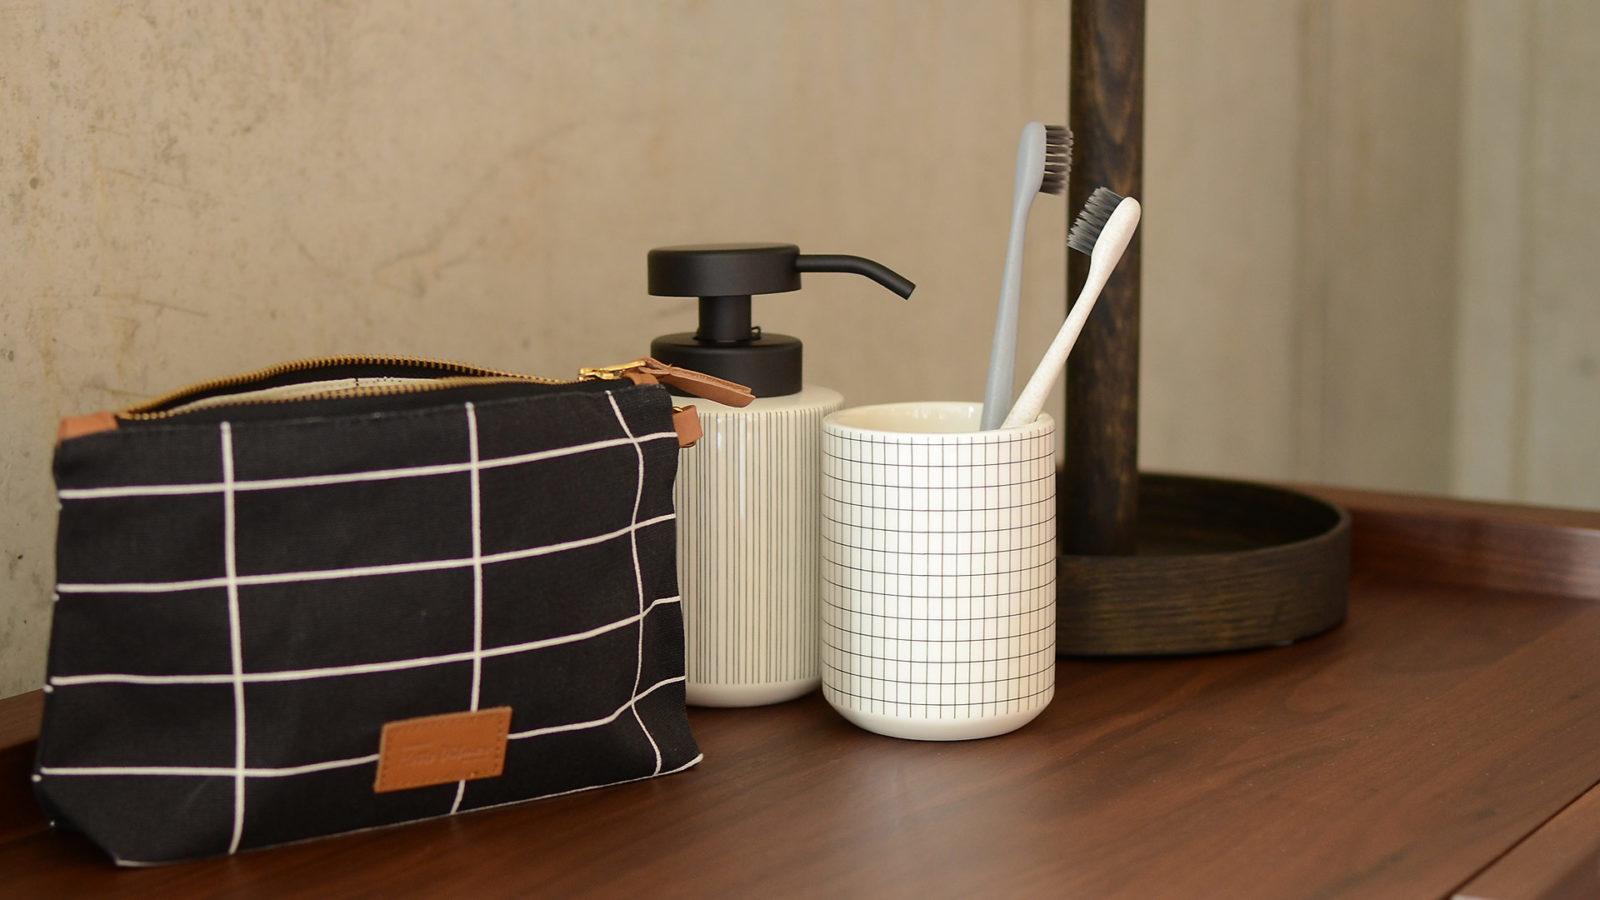 grid-soap-dispenser-and-pot-with-make-up-bag